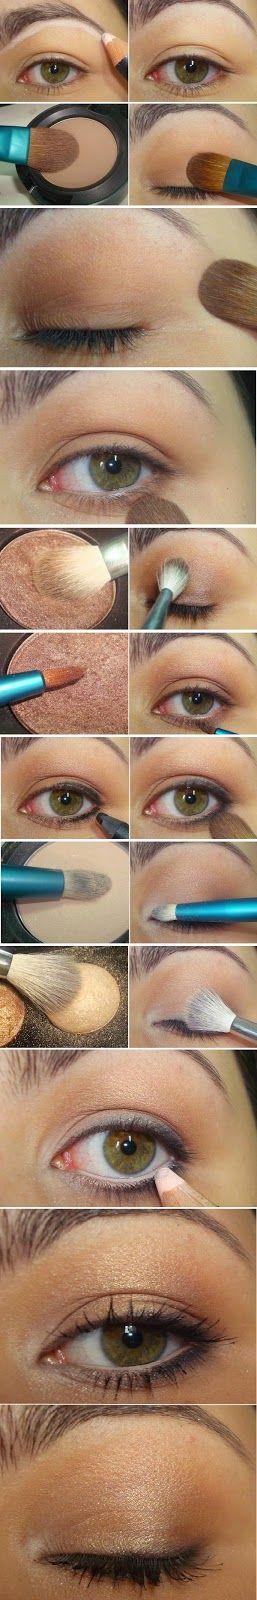 Everyday Chic Neutral Makeup Tutorials / Best LoLus Makeup Fashion